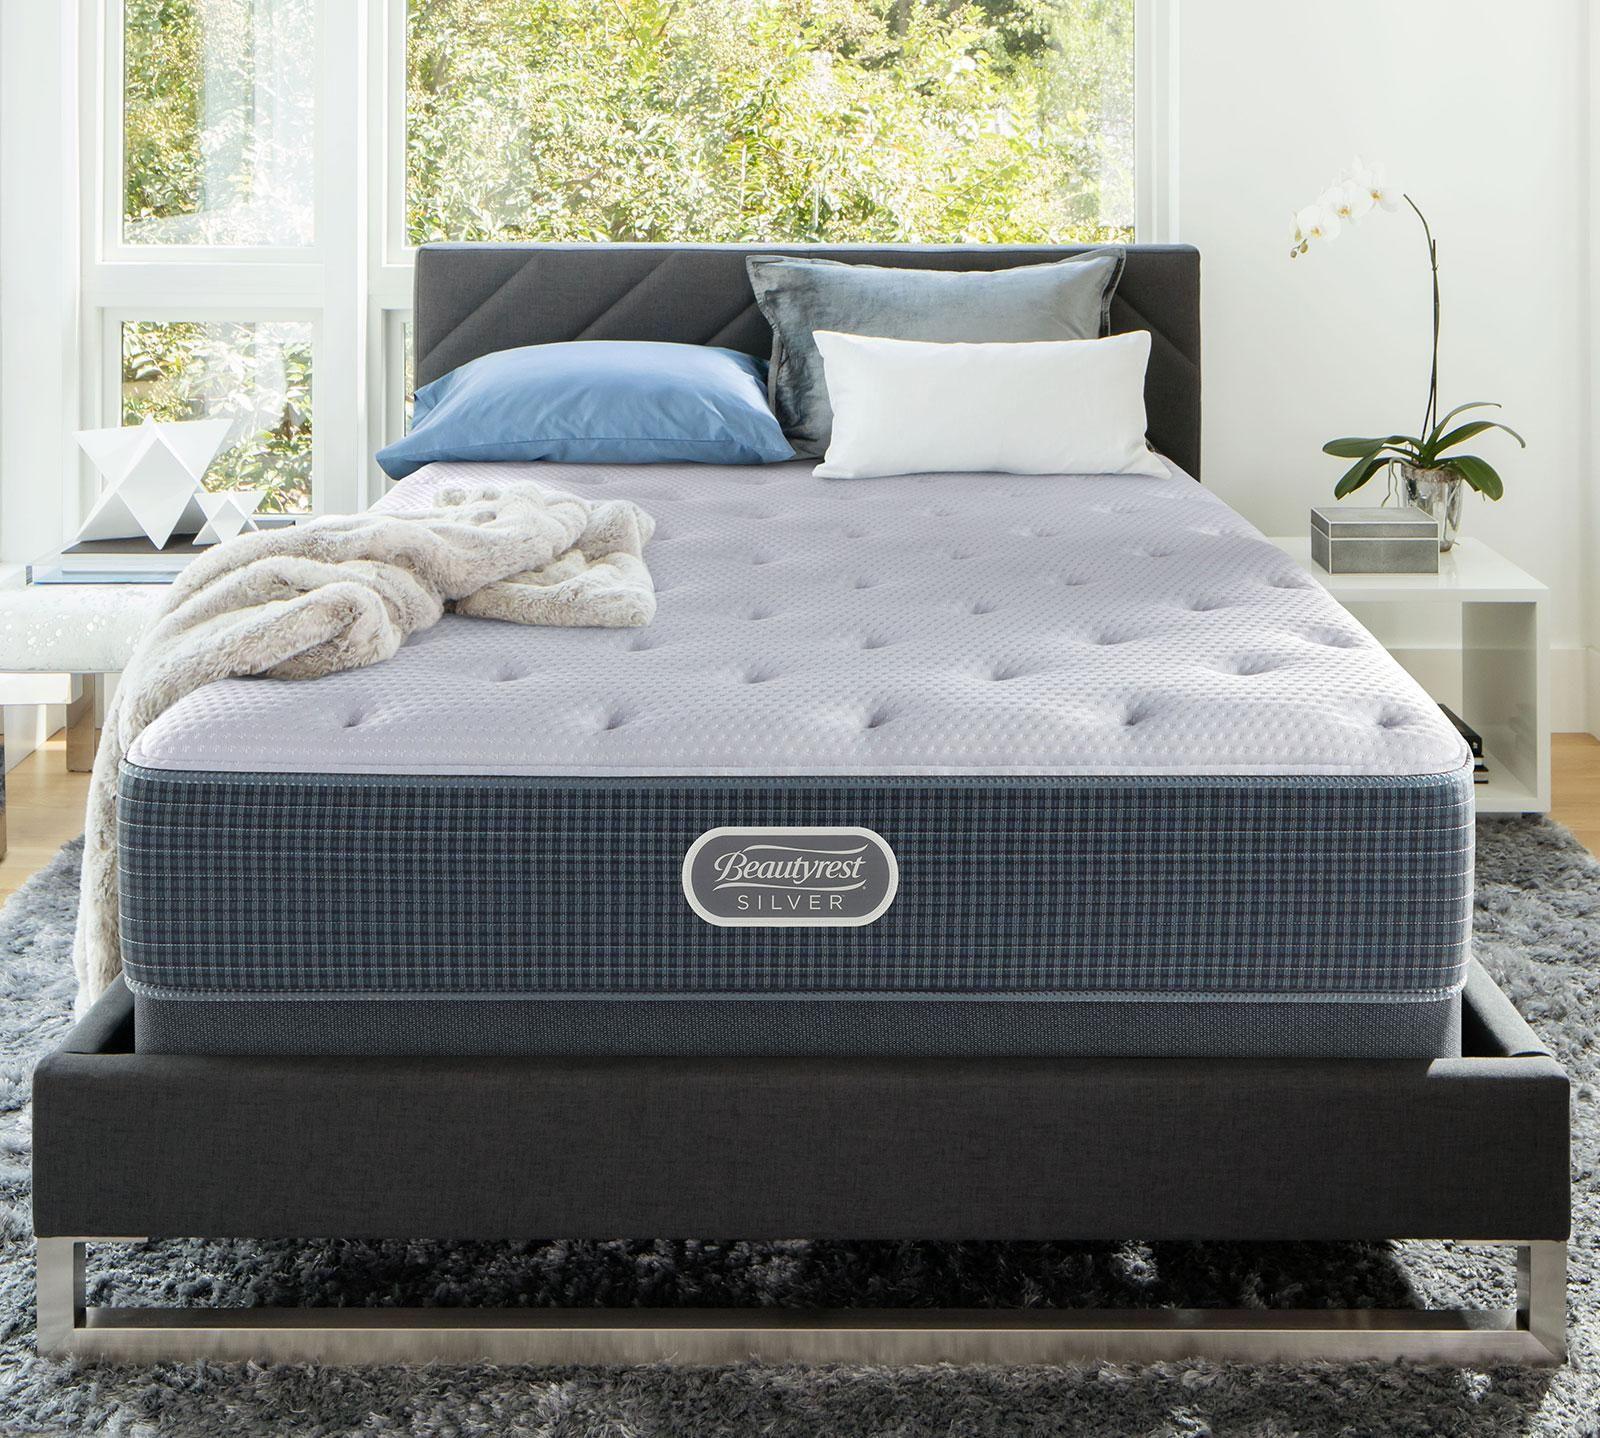 Beautyrest California King Silver Offshore Mist 12 25 Inch Luxury